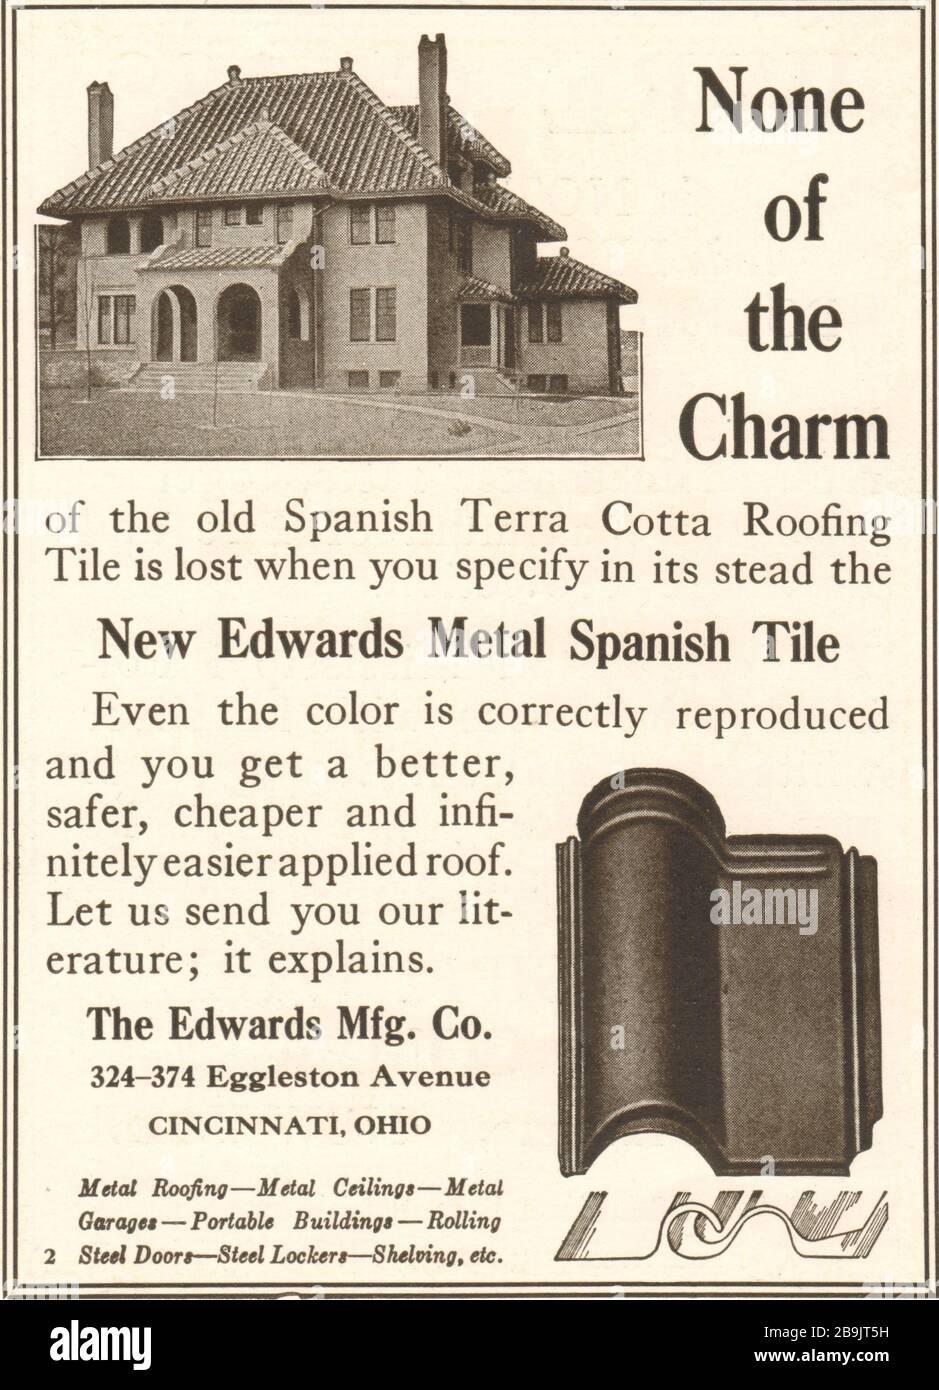 https www alamy com none of the charm new edwards metal spanish tile the edwards manufacturing co 324 374 eggleston avenue cincinnati ohio 1921 image350153373 html